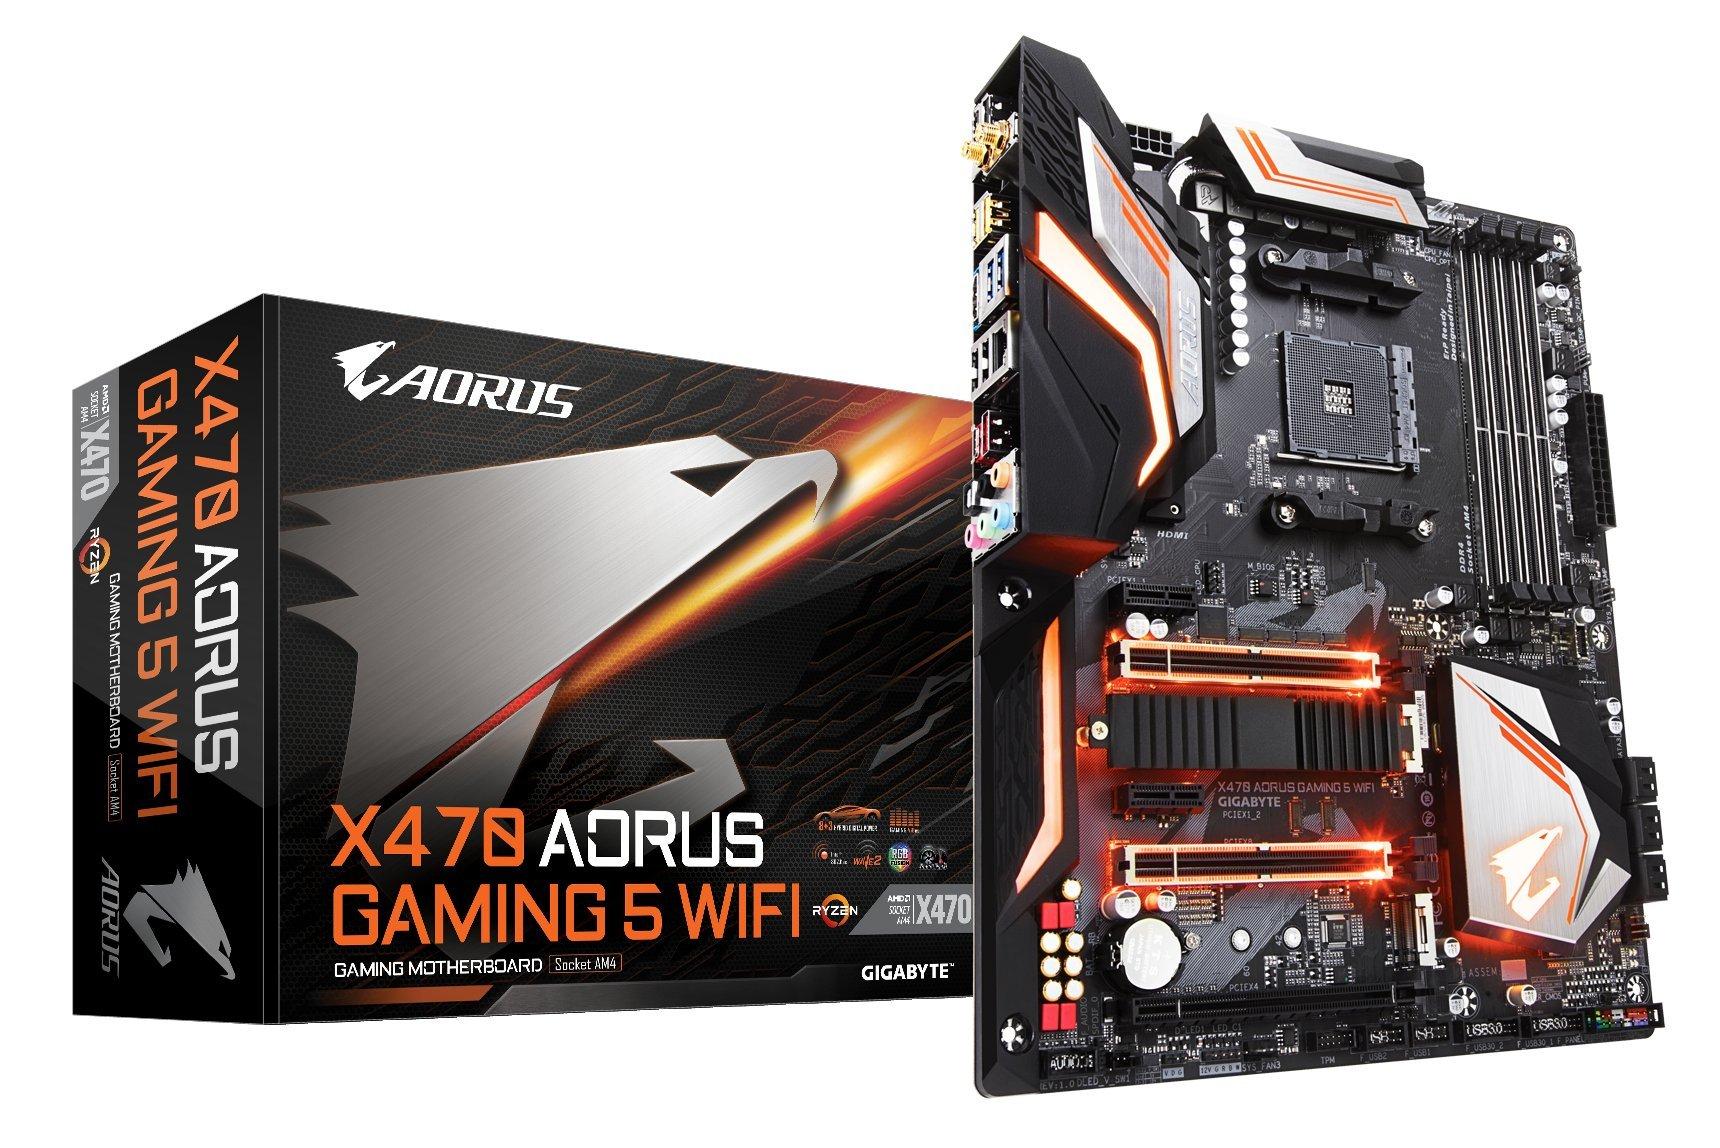 GIGABYTE X470 AORUS GAMING 5 WIFI (AMD Ryzen AM4/ X470/ USB 3.1 Gen 2 Type A, Type C/ ATX/ DDR4/ Intel Wave 2 WIFI/ M.2/ HDMI/ Motherboard)